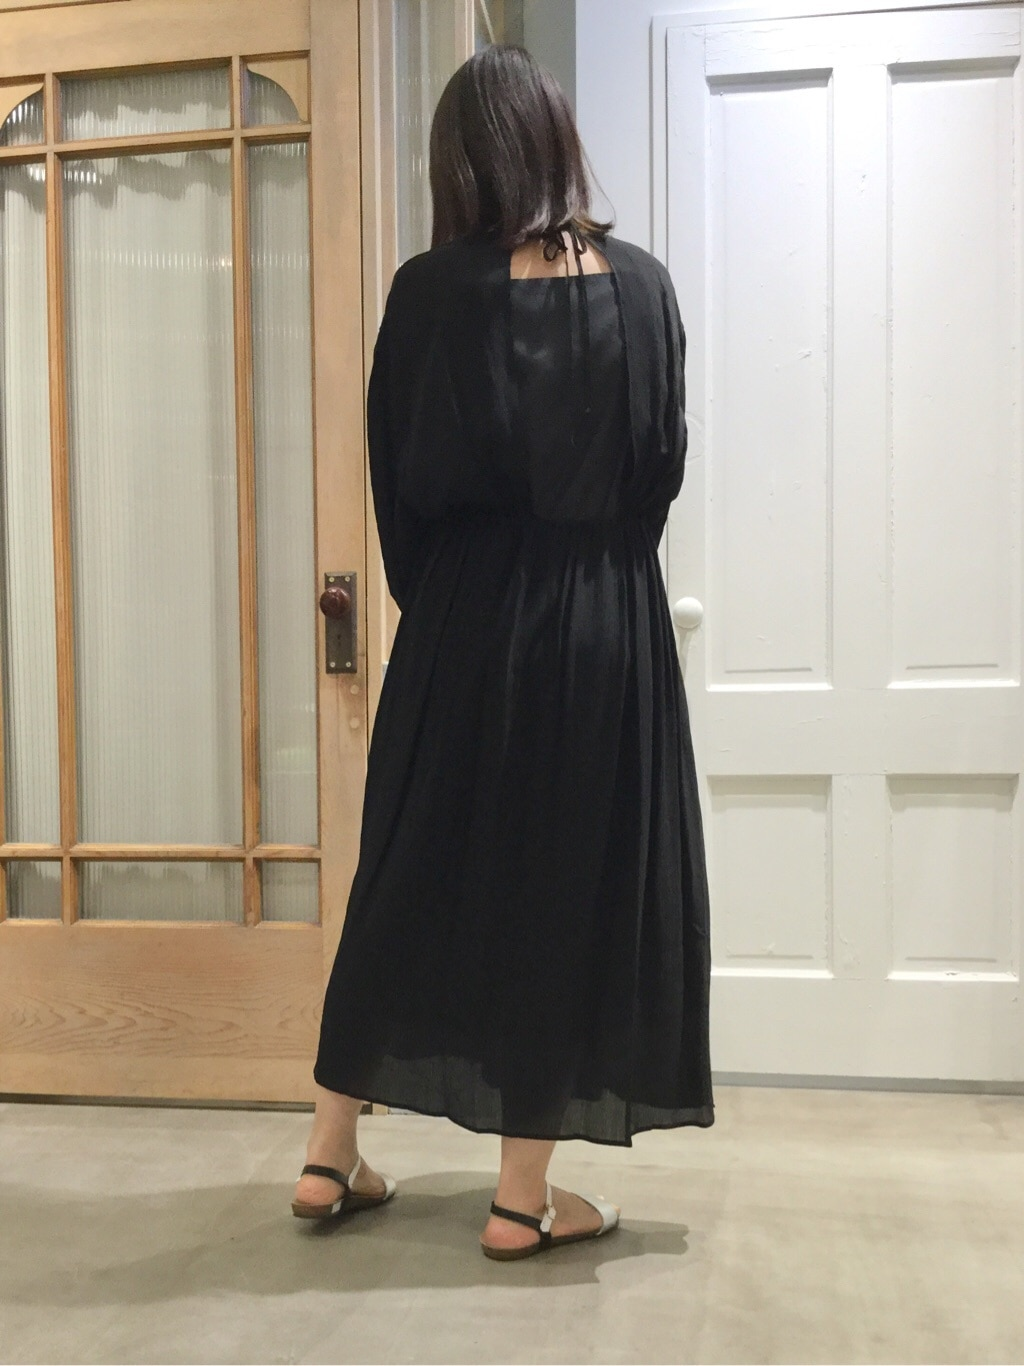 yuni / bulle de savon 京都路面 身長:157cm 2020.07.31